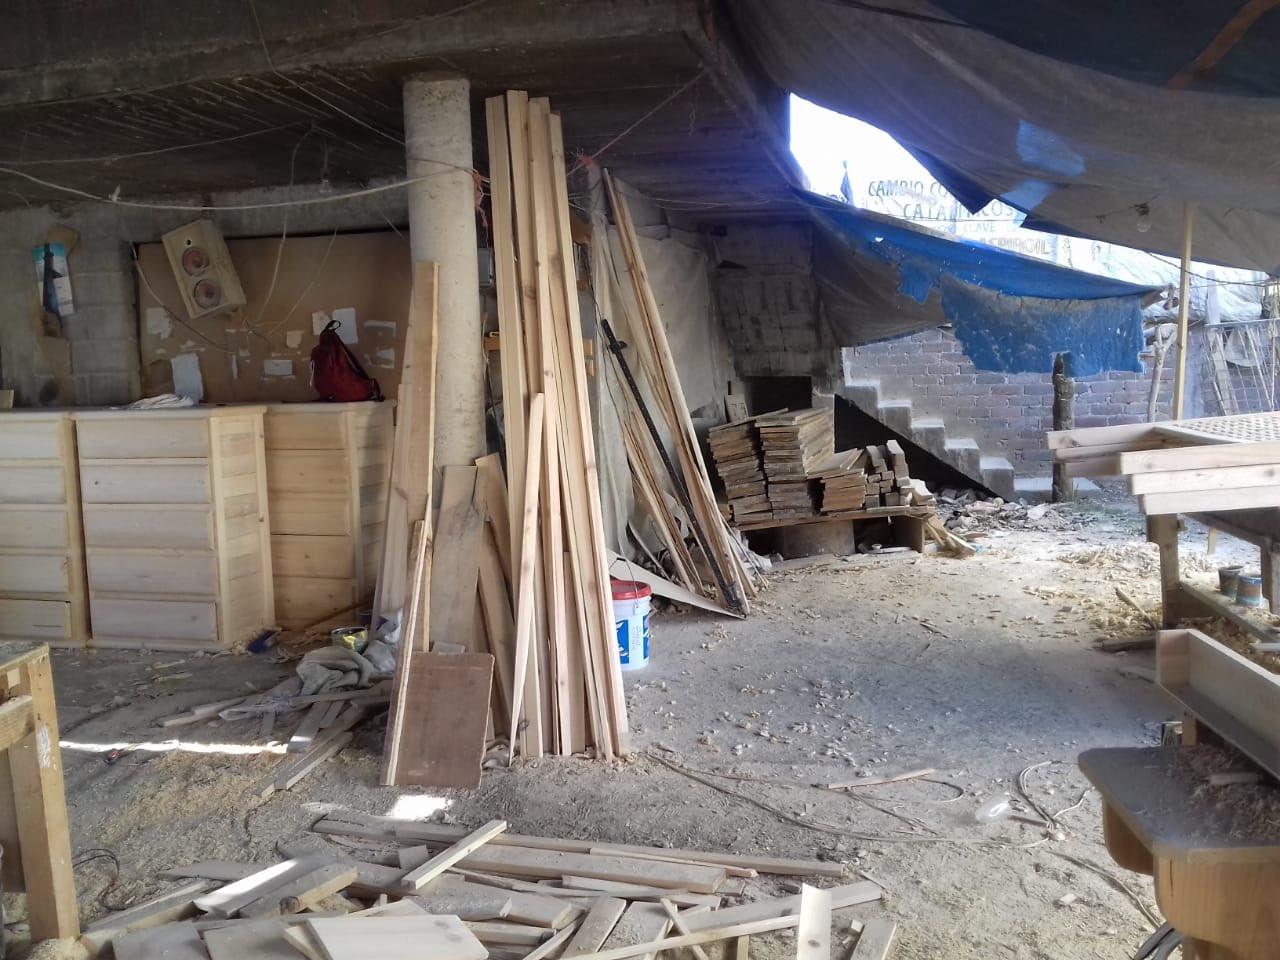 Aprovechamiento ilegal de madera